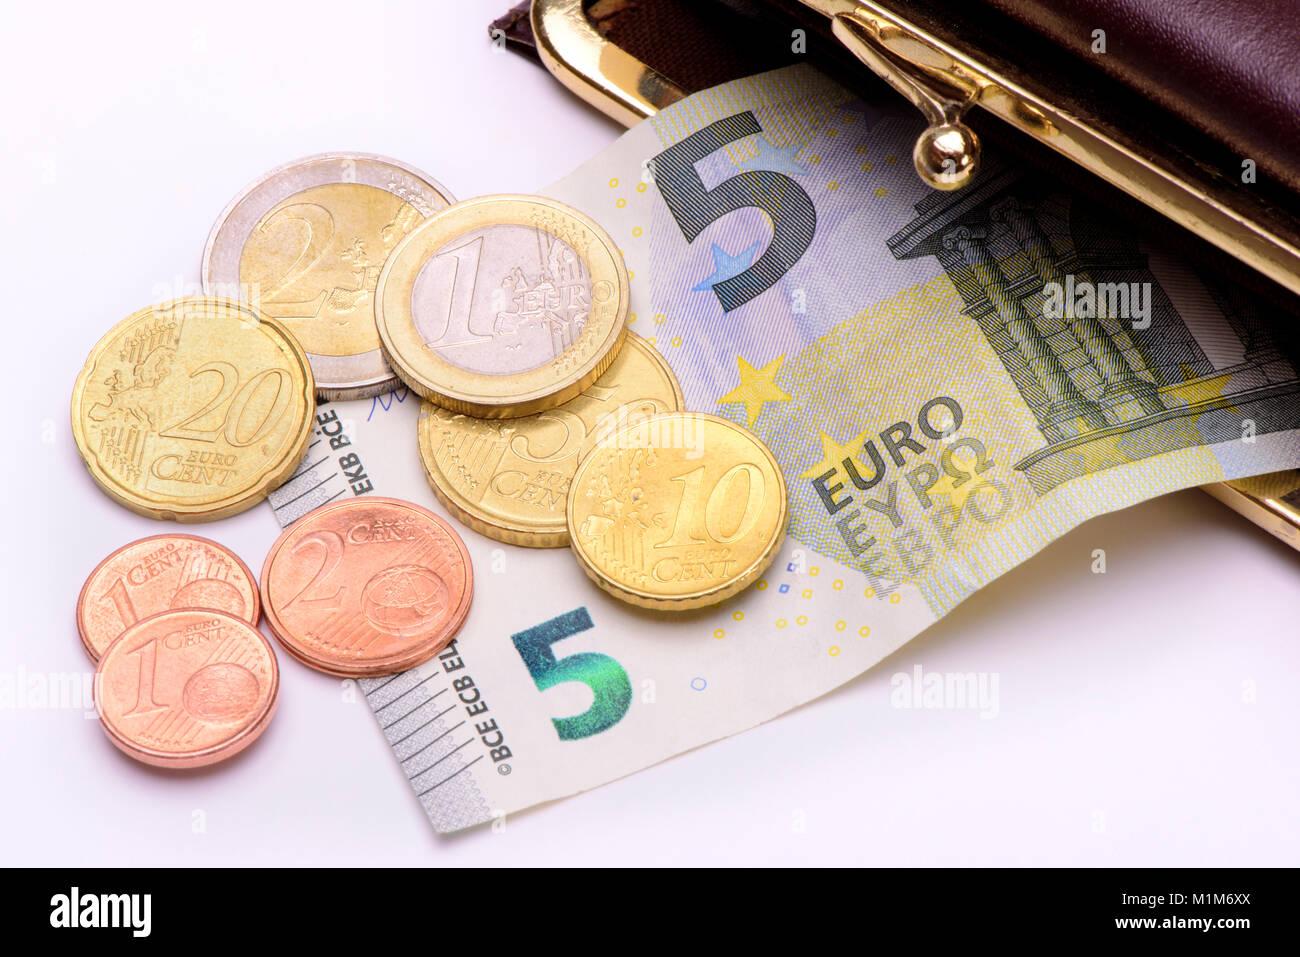 Mindestlohn 8,84 Euro pro Stunde Stockbild